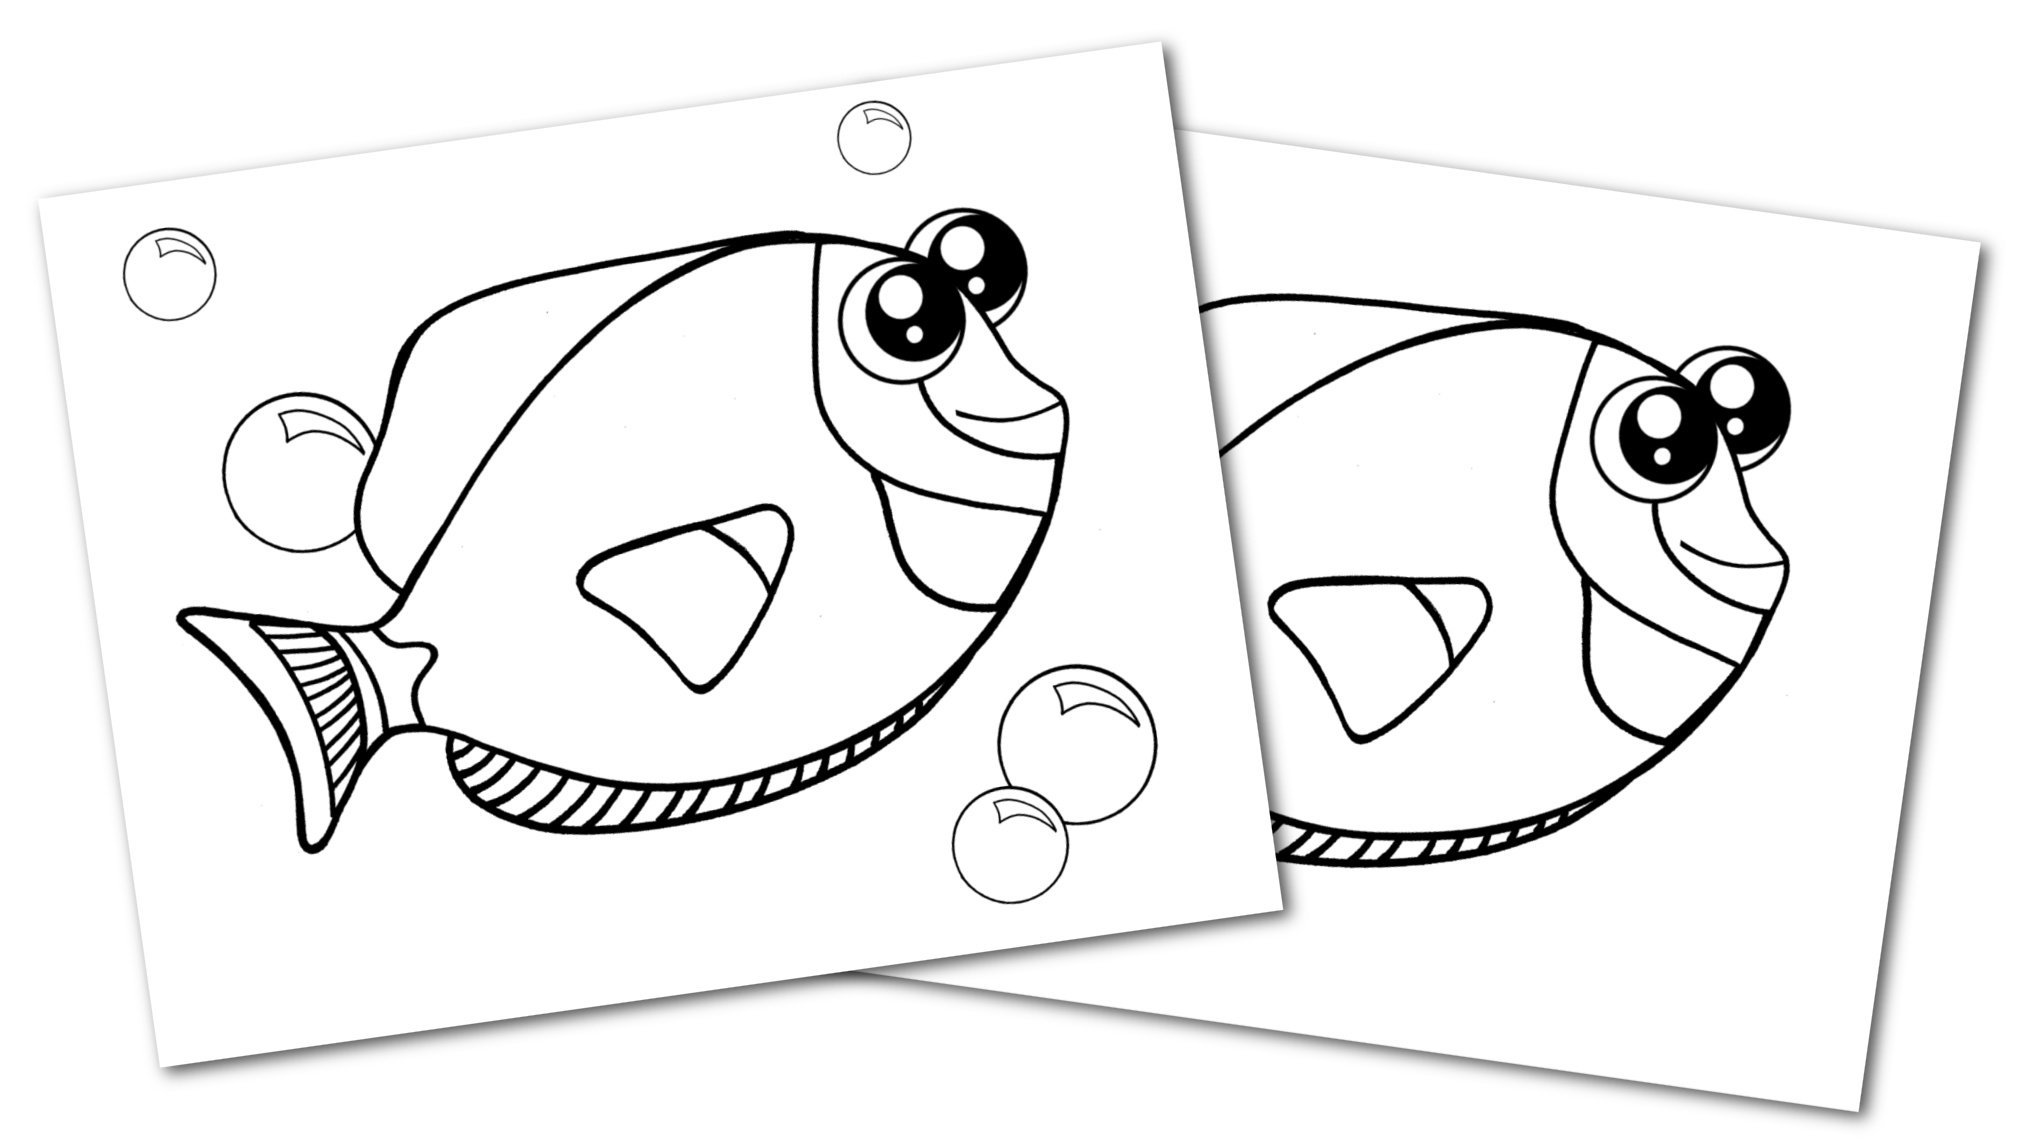 Free Printable Blue Tang Ocean Animal Convertkit for Toddlers, Kids and Preschoolers